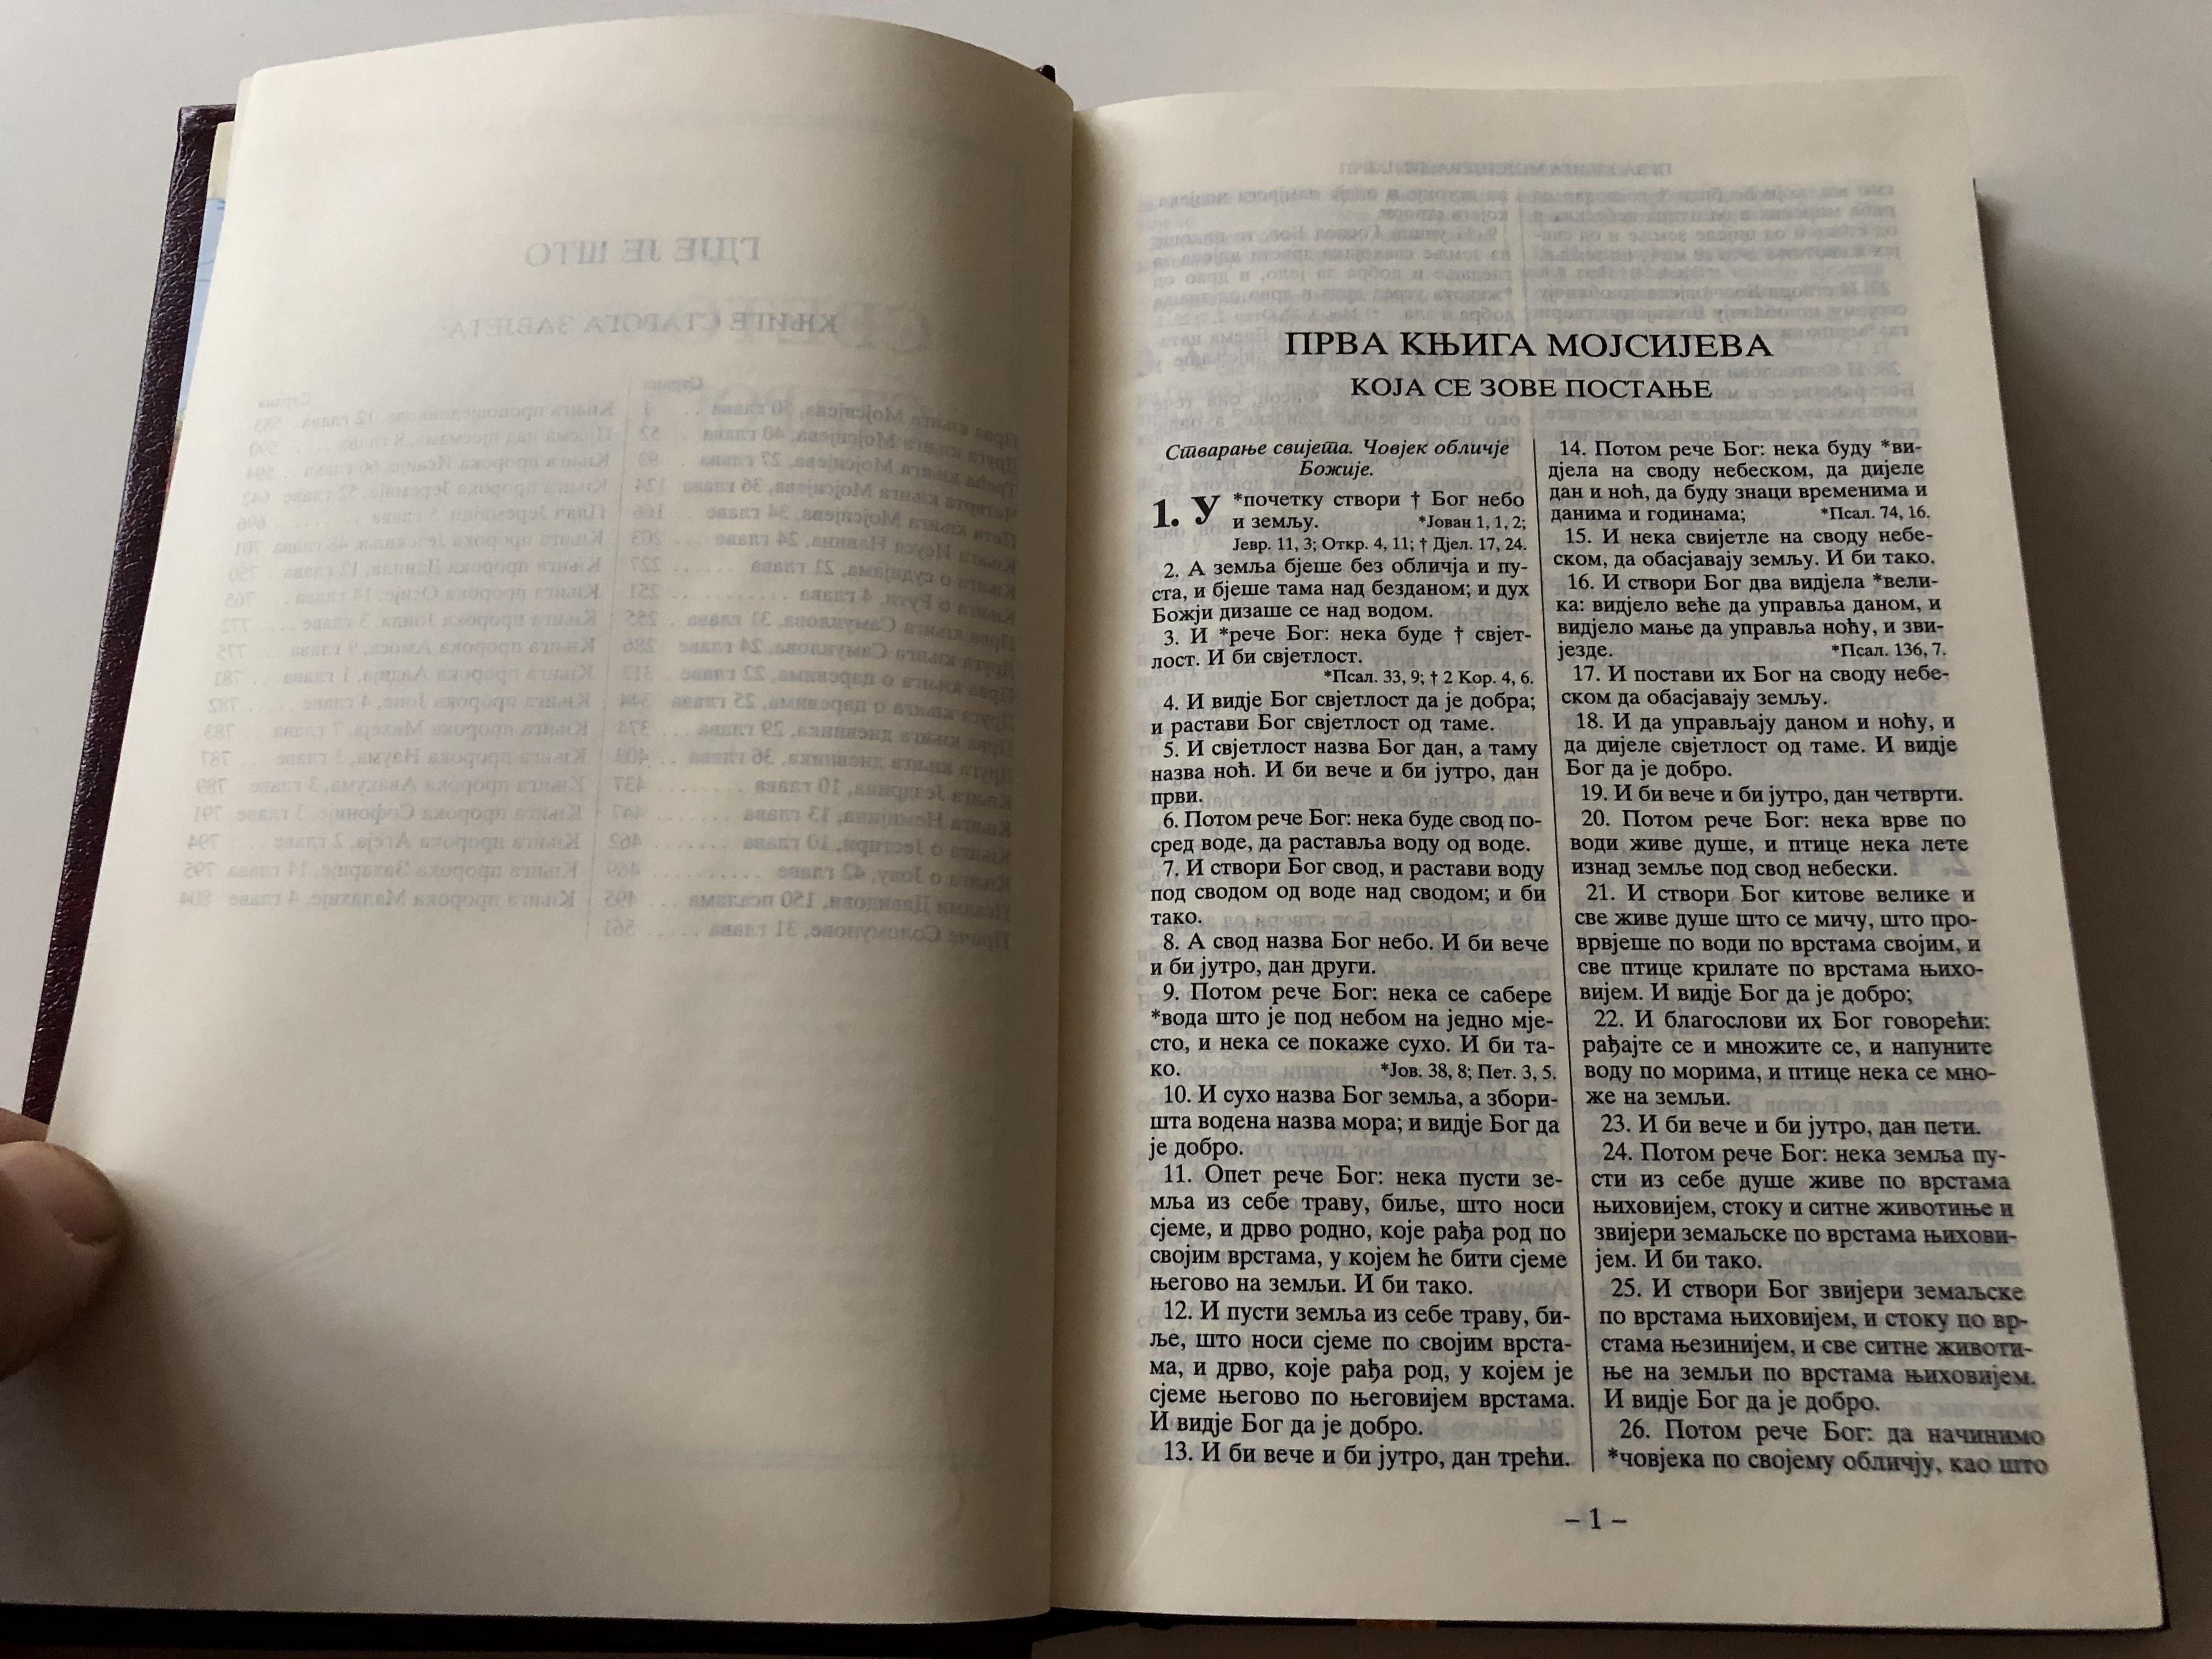 serbian-language-bible-burgundy-cover-with-golden-cross-cyrillic-script-043hs-s-12-.jpg